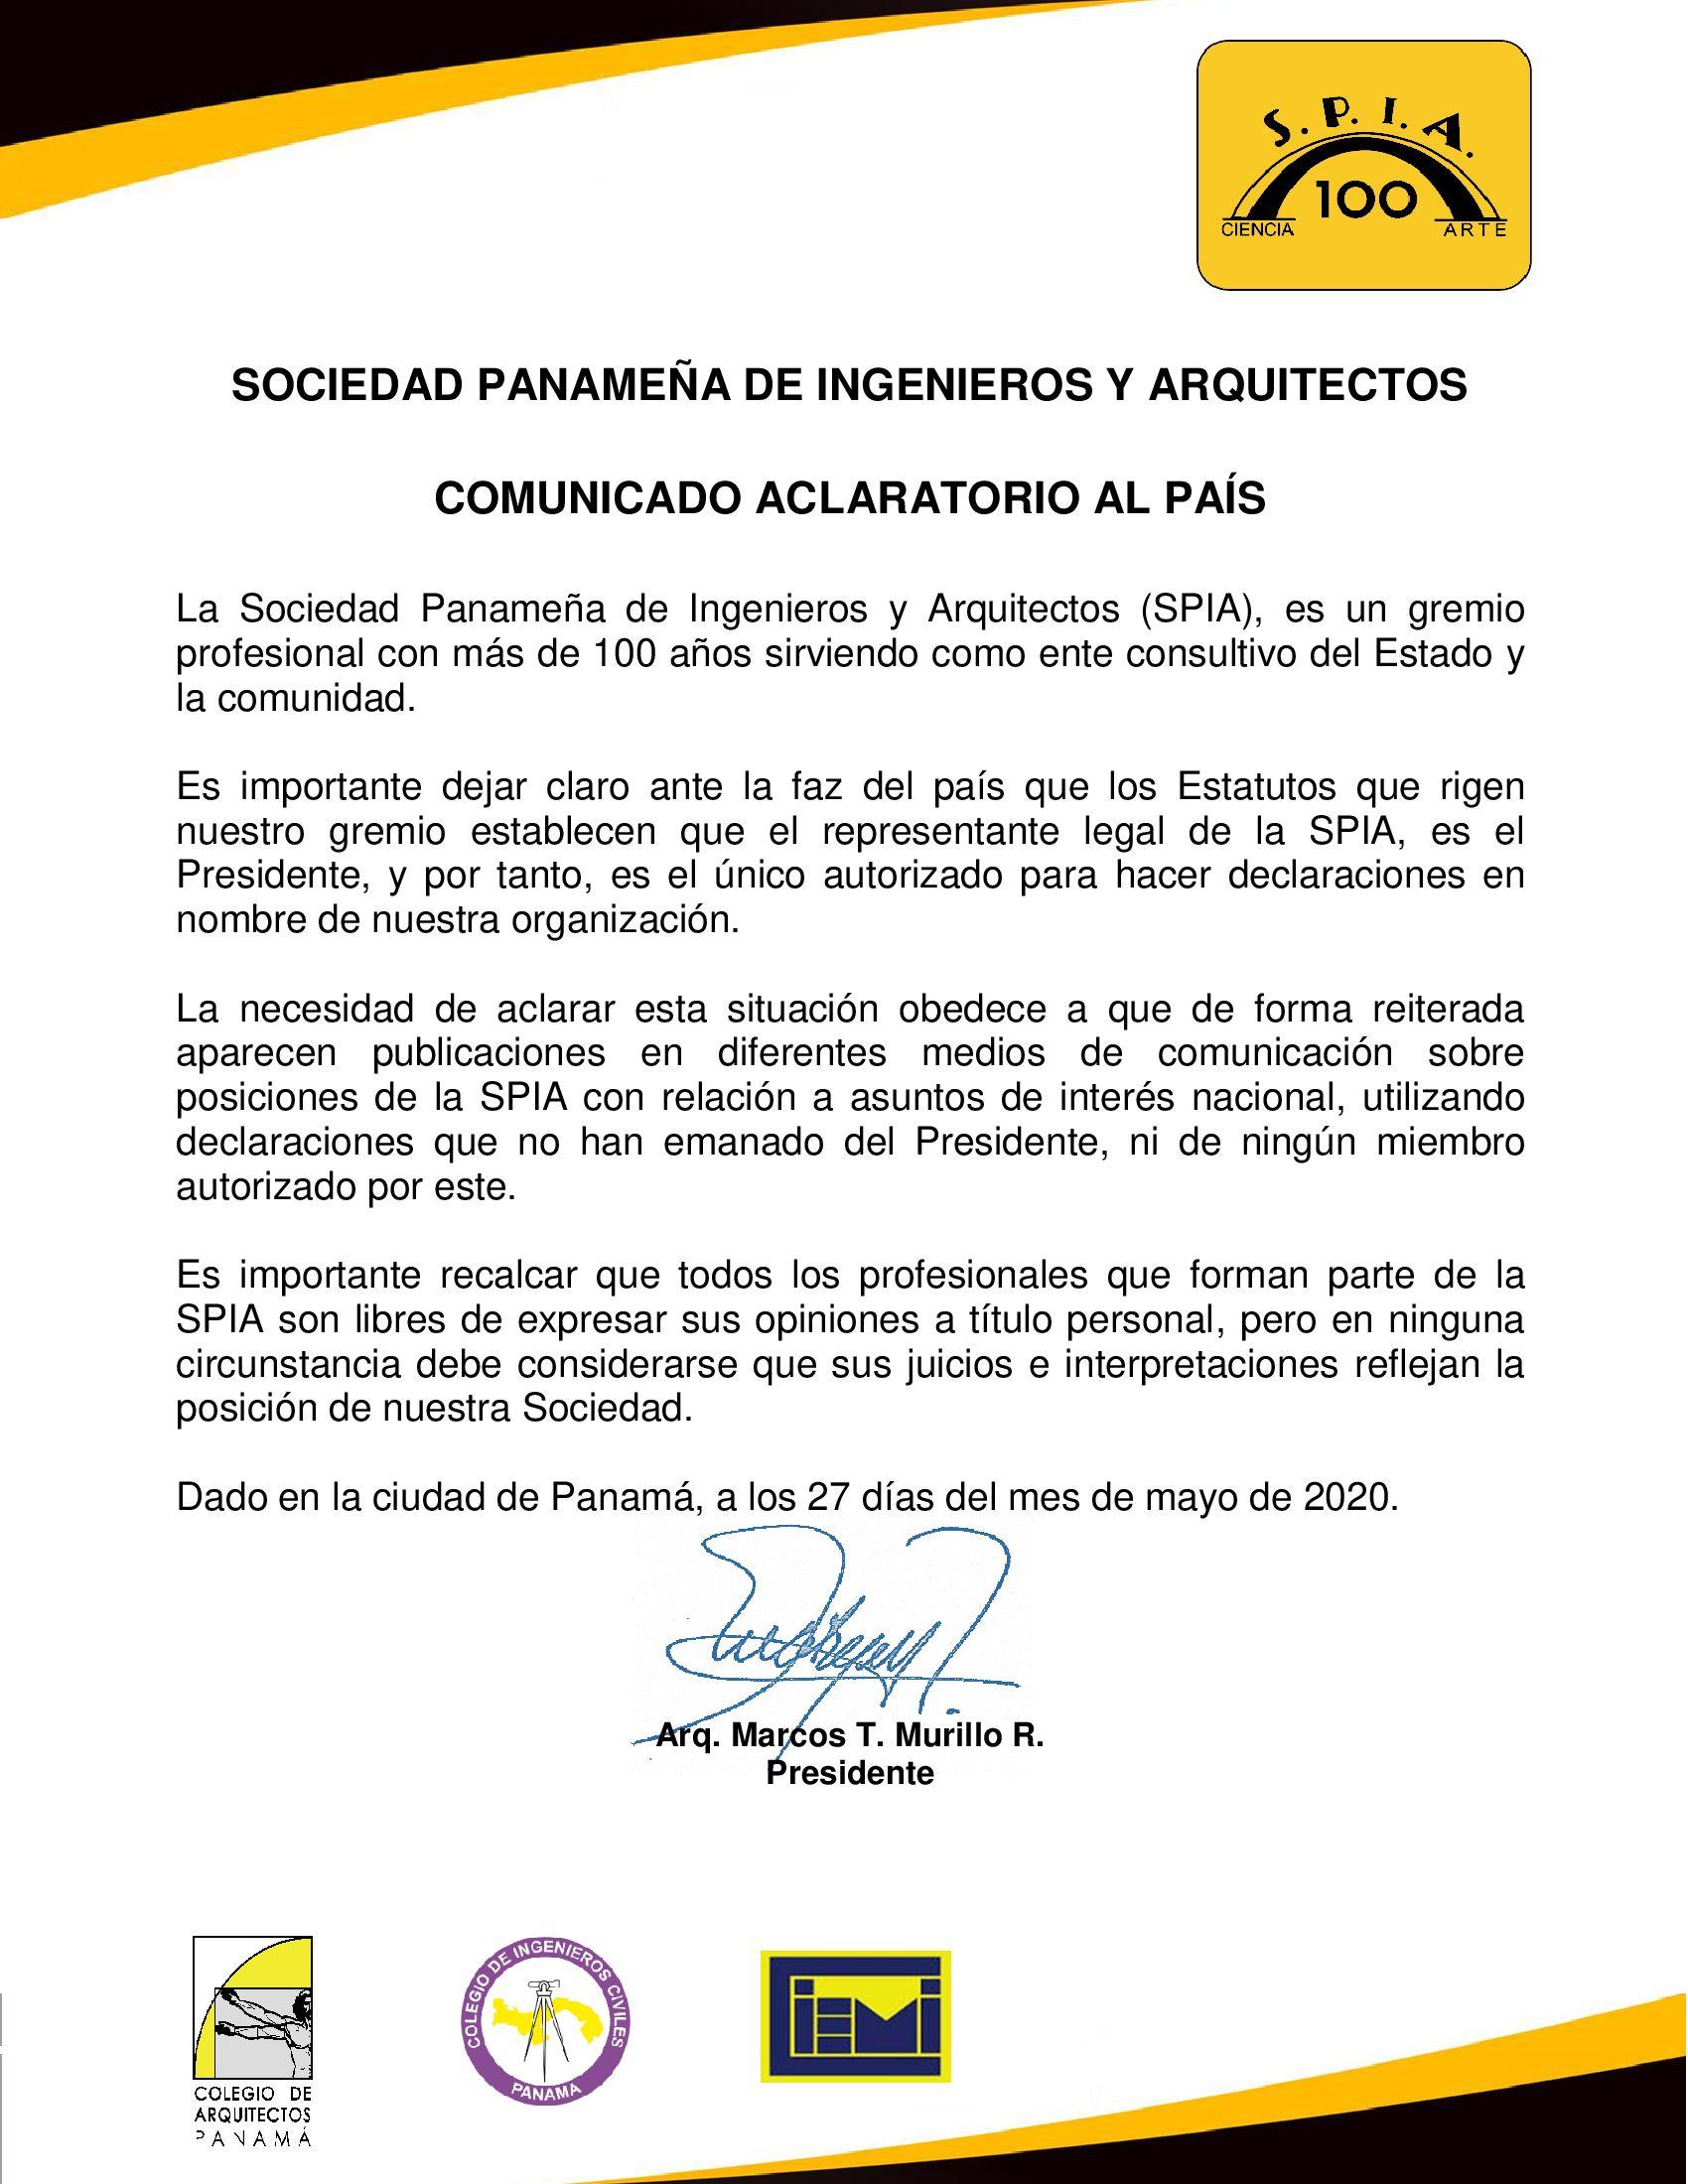 COMUNICADO-ACLARATORIO-AL-PAÍS-VOCERO-SPIA-25-MAYO-FINAL-firmado